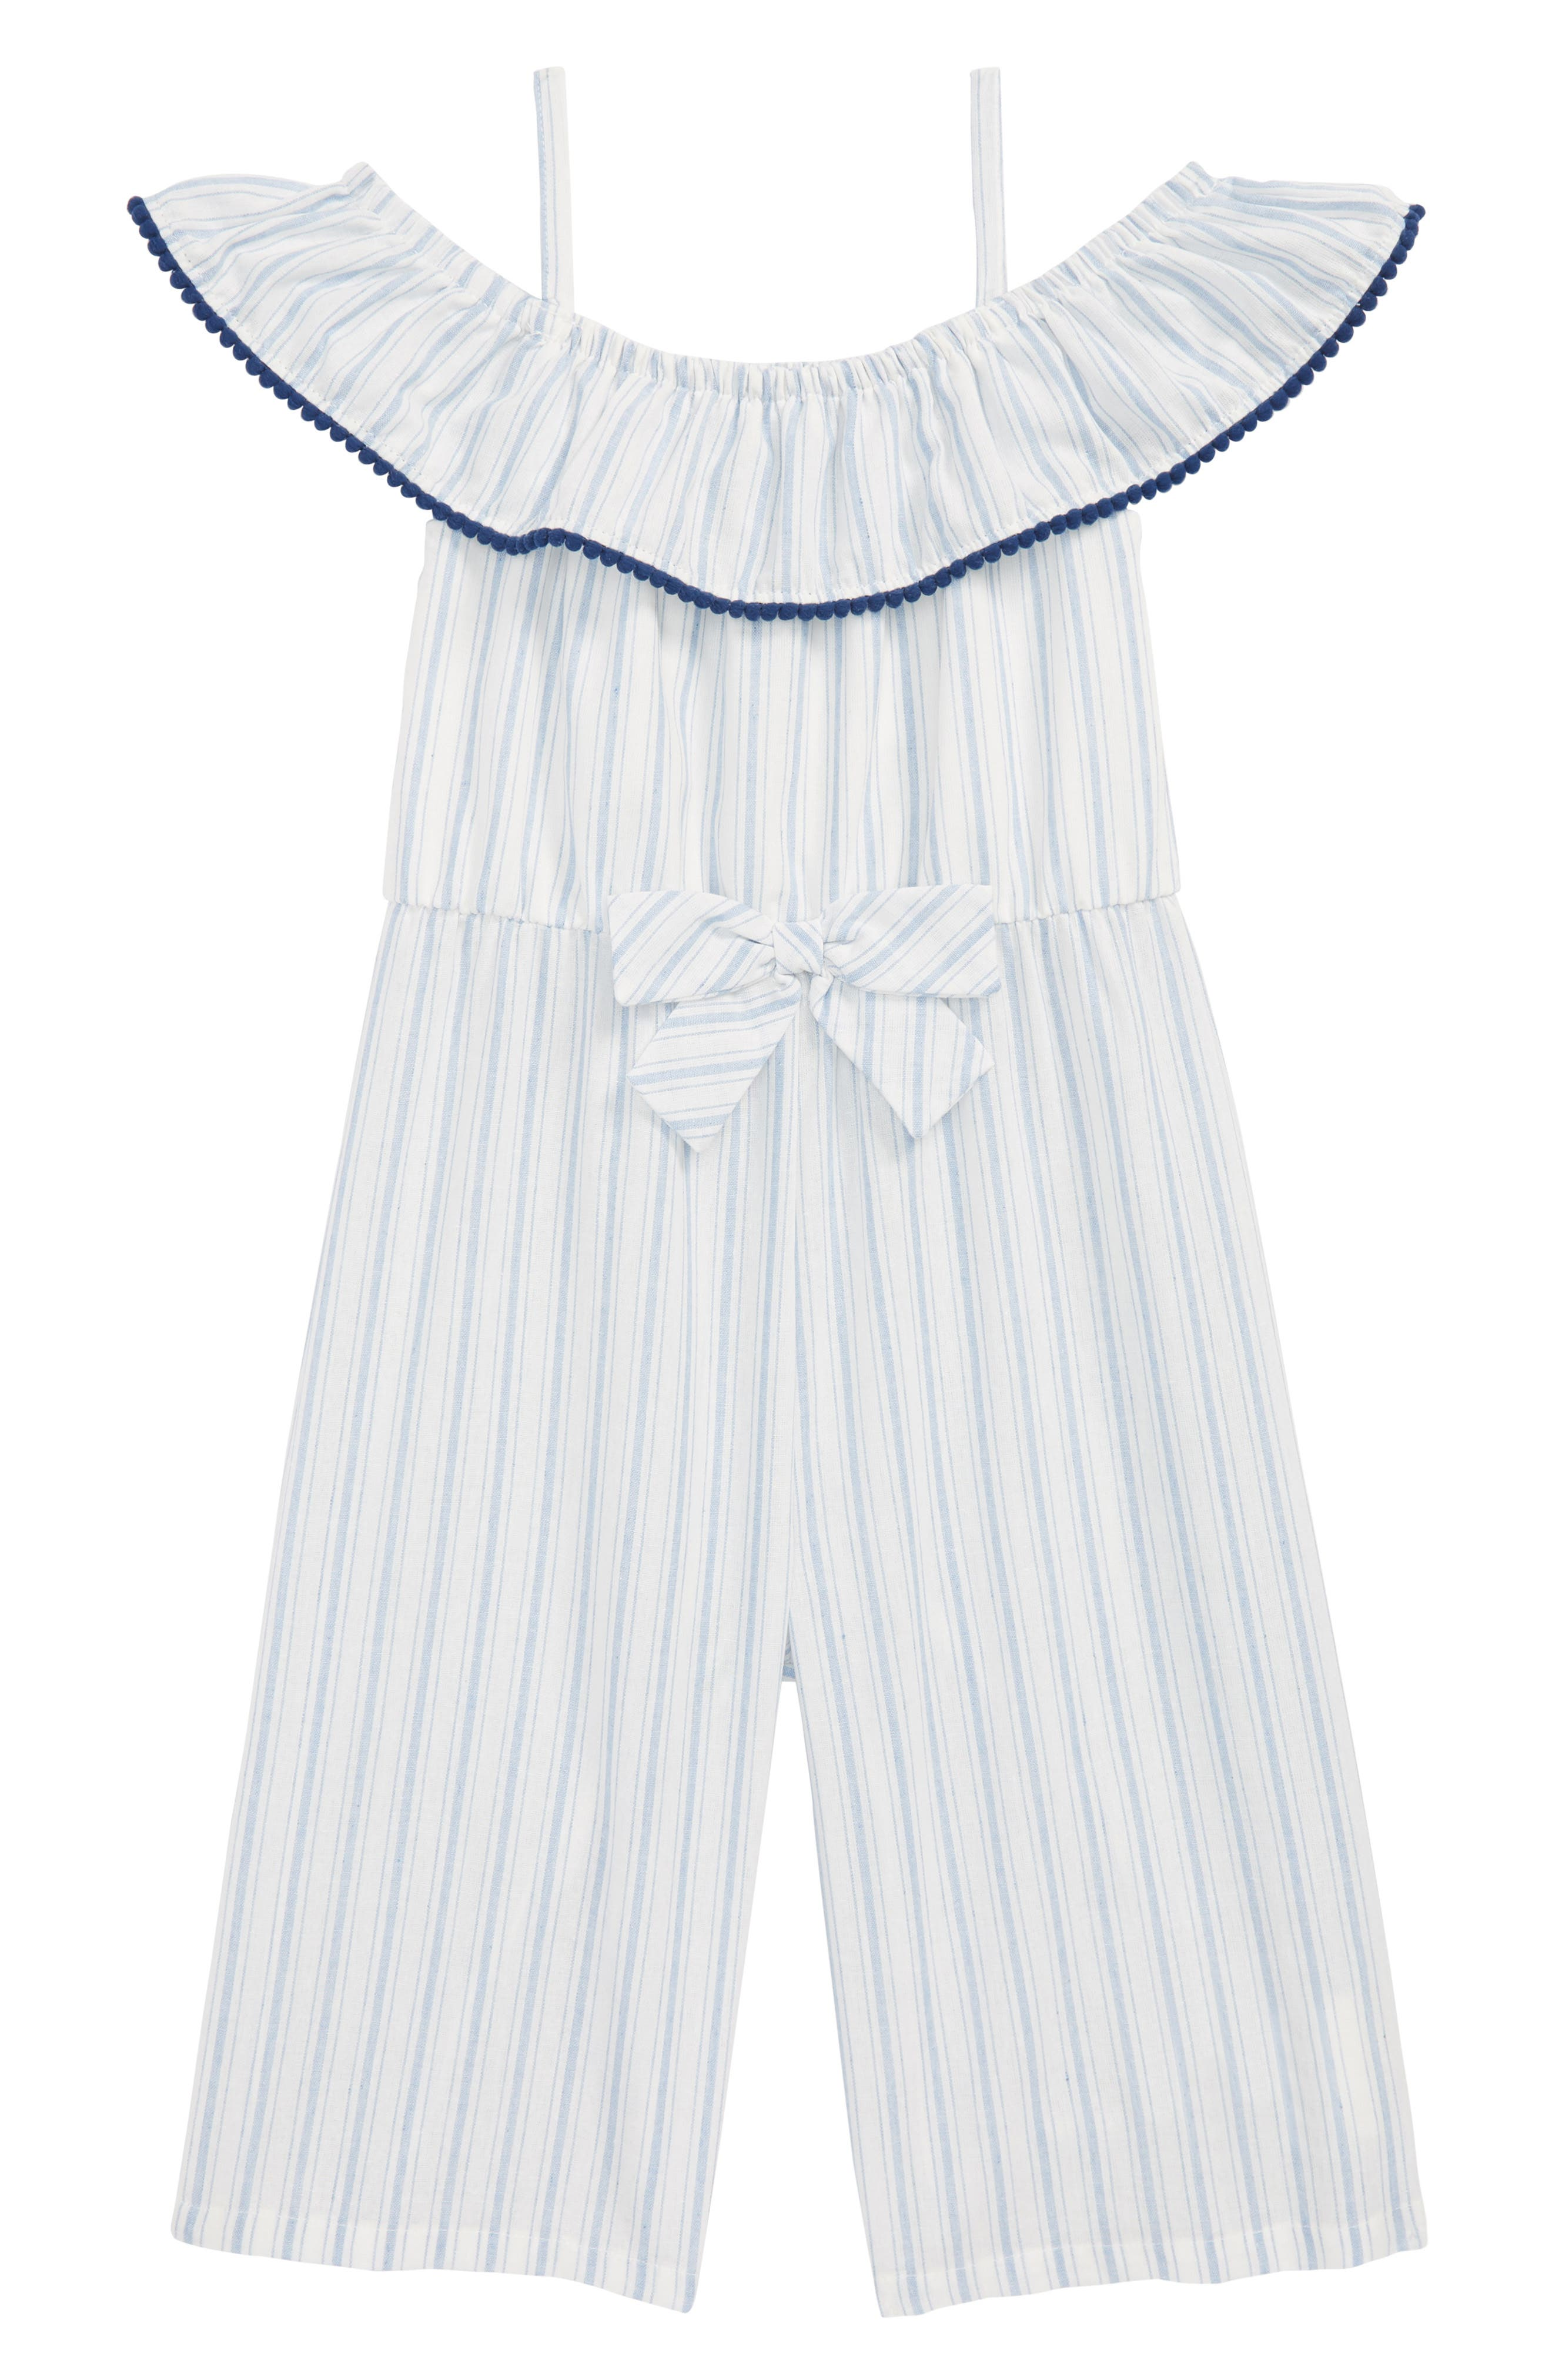 Pastourelle by Pippa & Julie Pom Pom Striped Jumper (Toddler Girls & Little Girls)